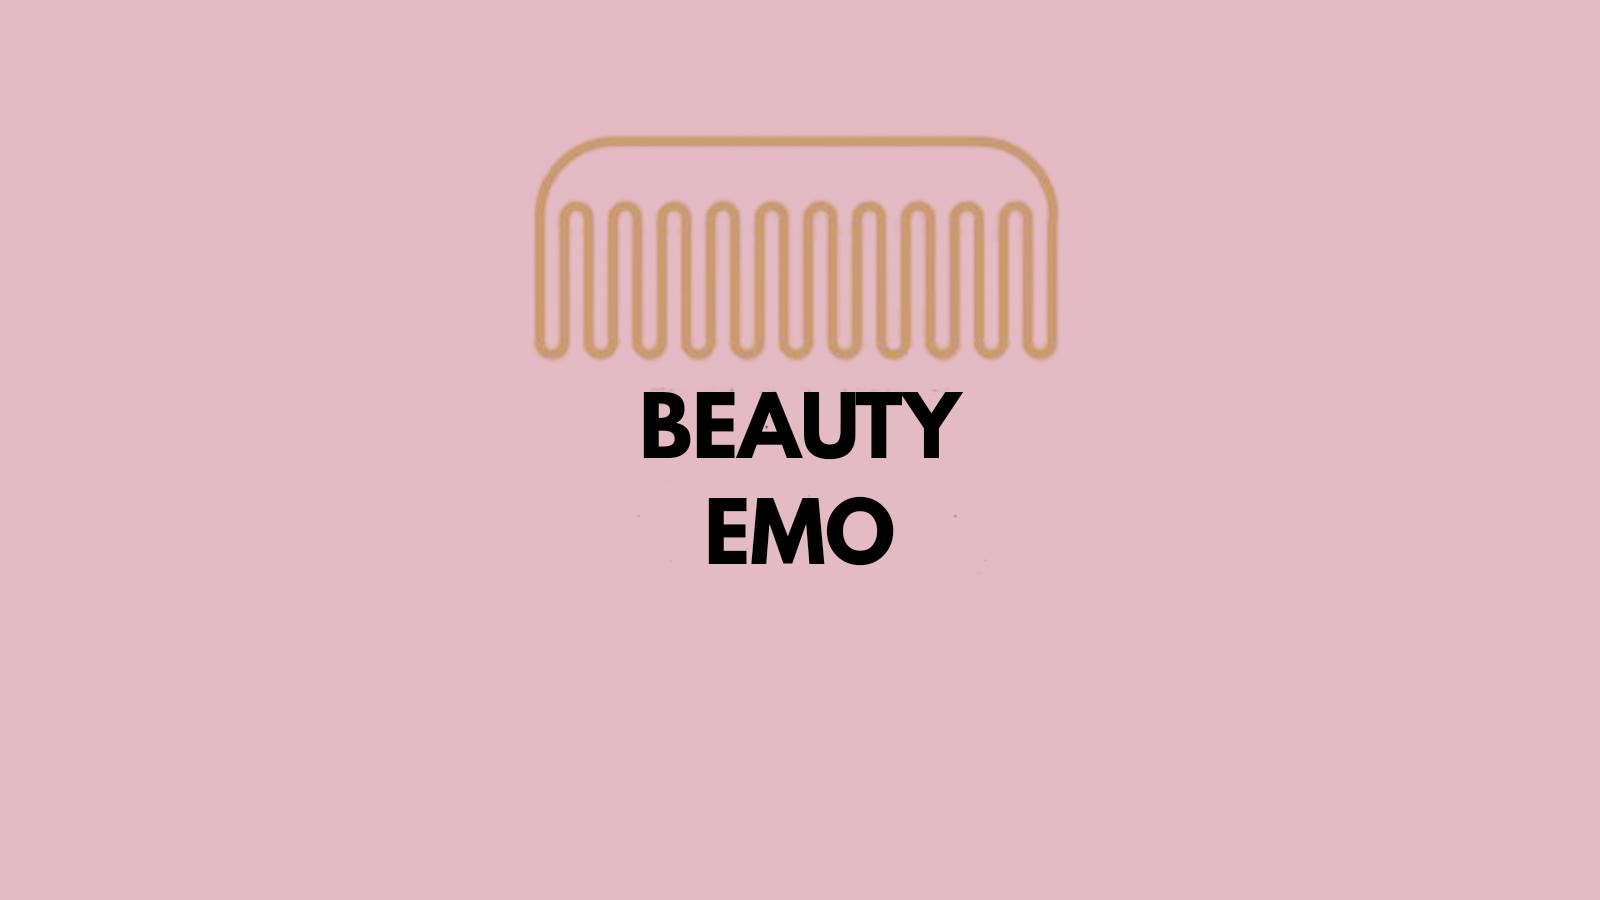 Model Emo